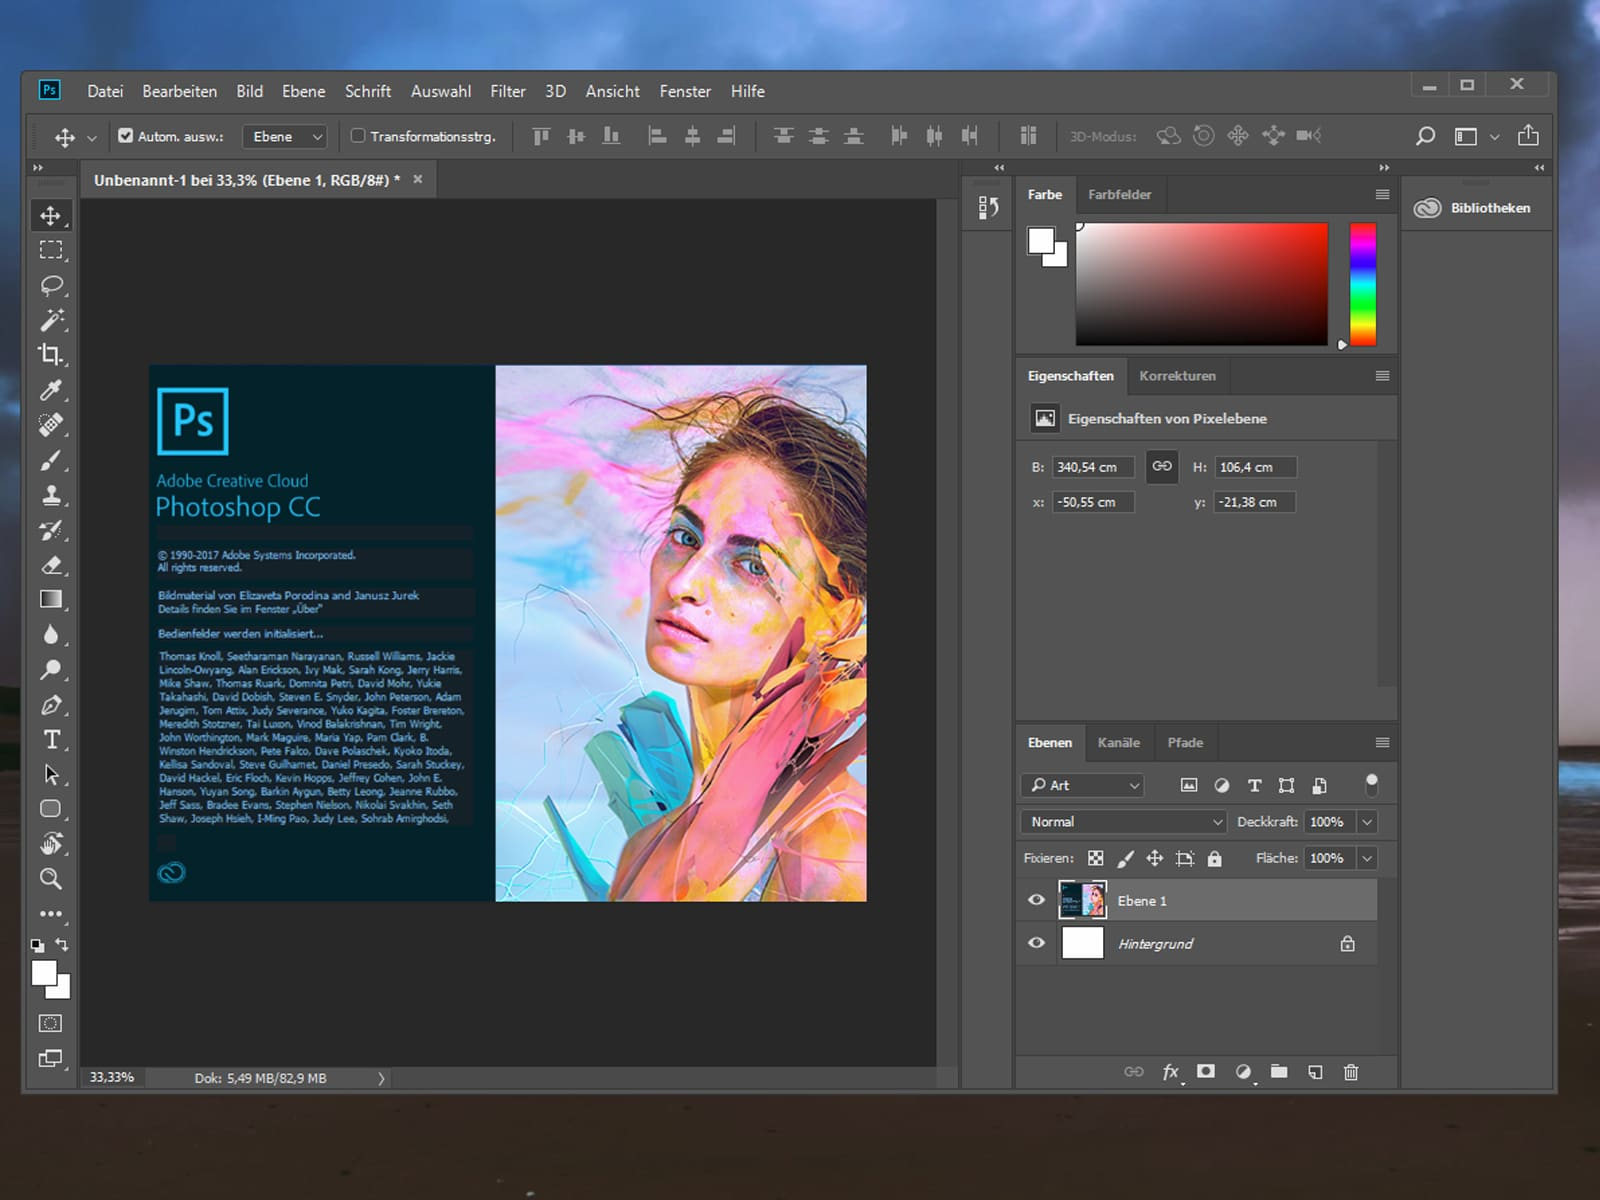 Requisitos para instalar Photoshop CC